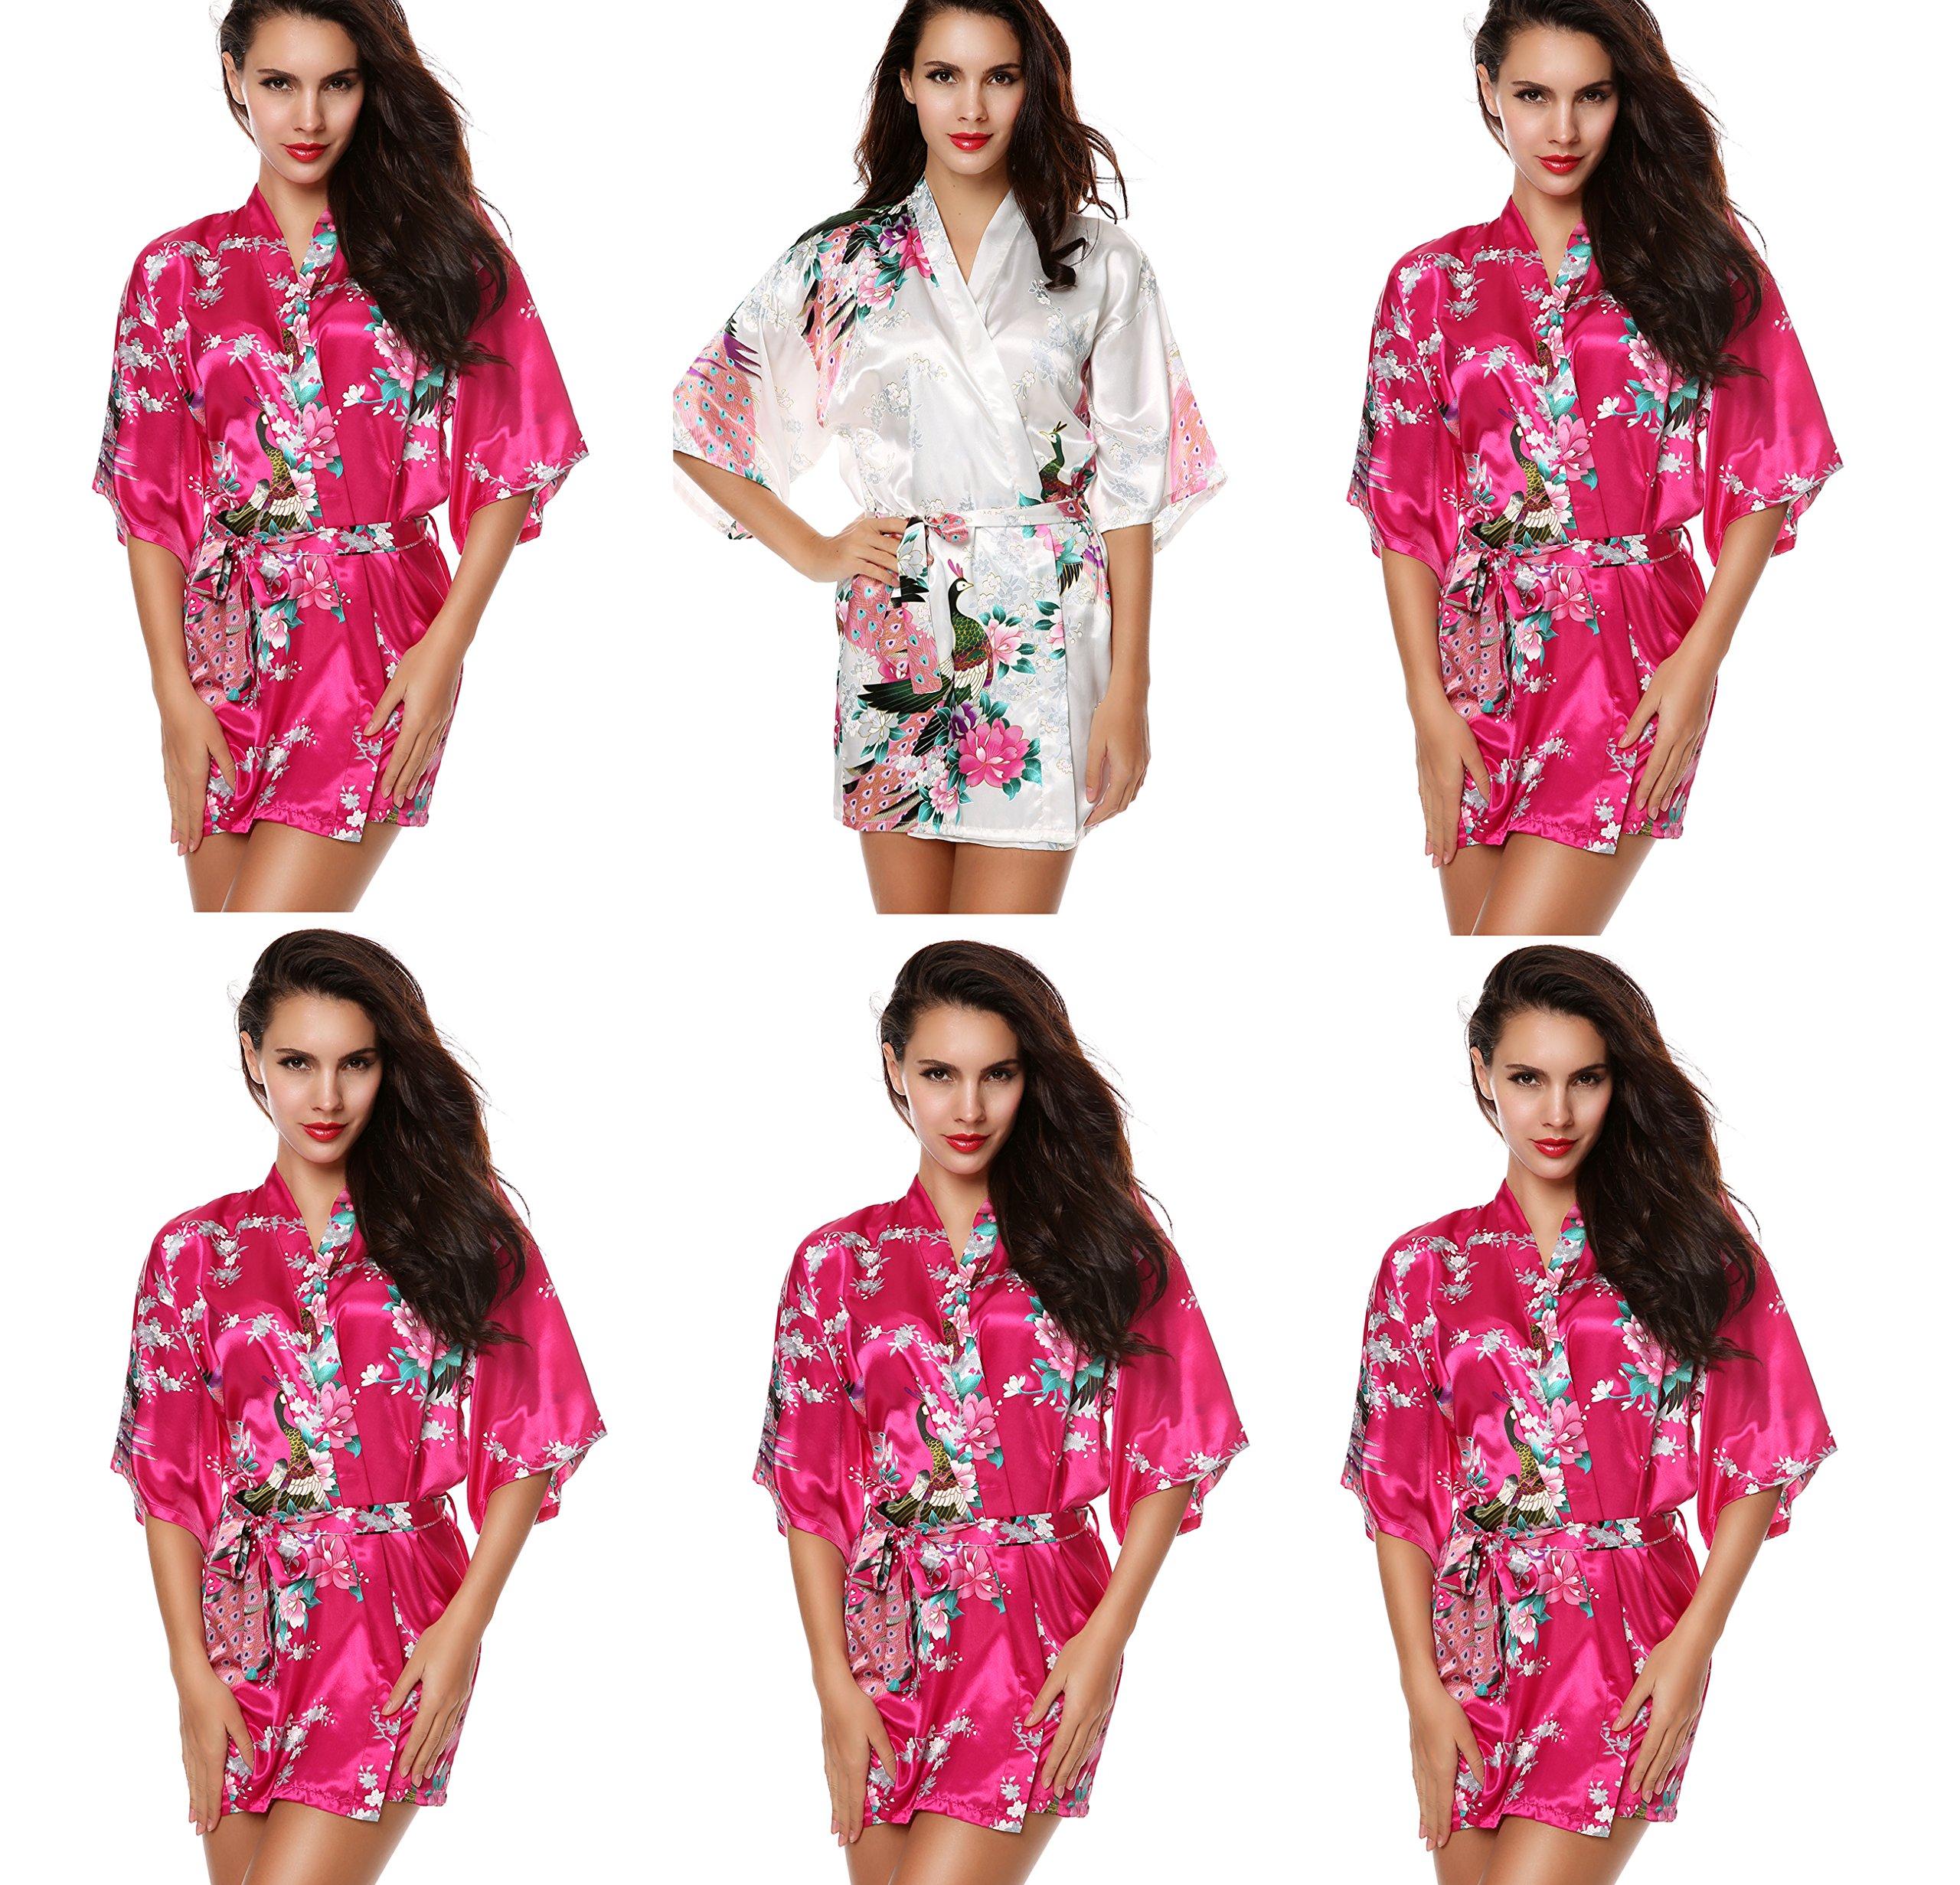 Avidlove Women's Robes Modern Celebrations Silk Bridesmaid Peacock Kimono Robe 6 Packs